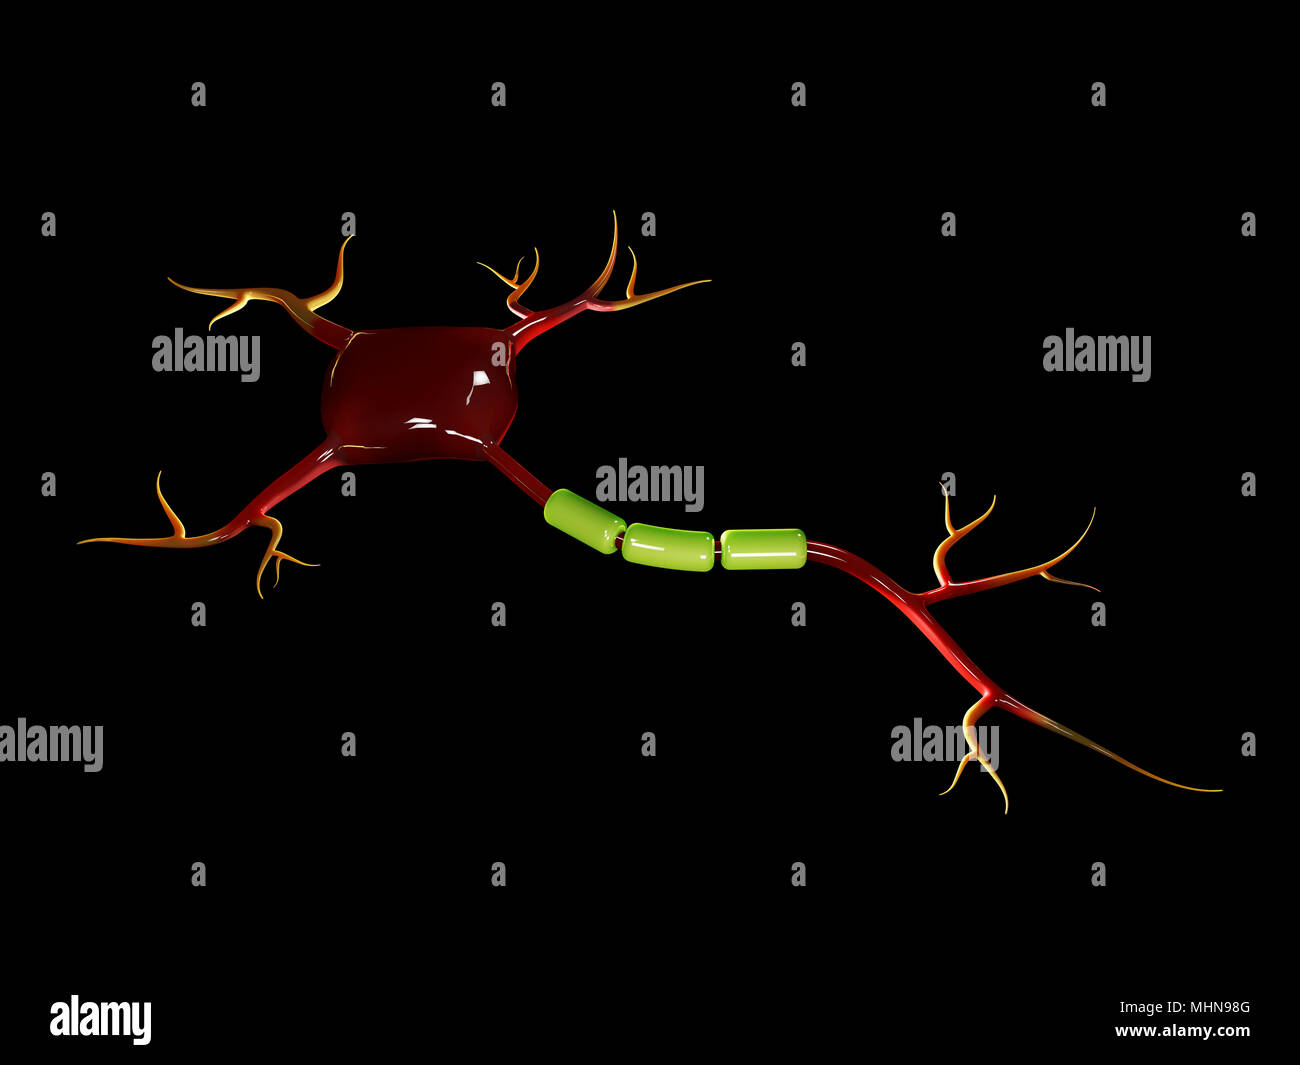 3d illustration of neuron cells, high resolution 3D illustration isolated black - Stock Image